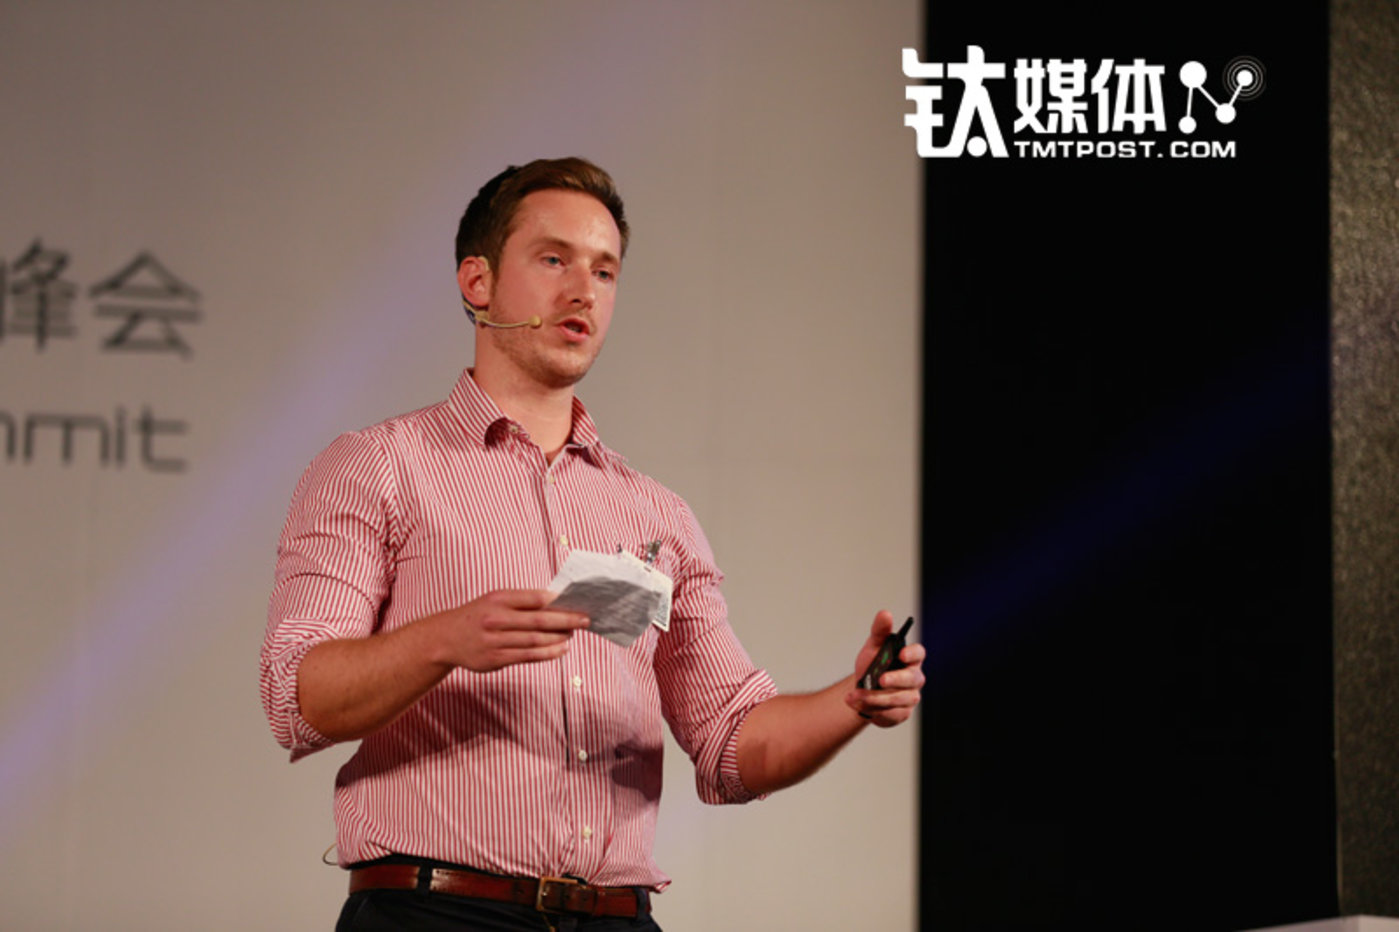 Circuithub CEO Andrew Seddon